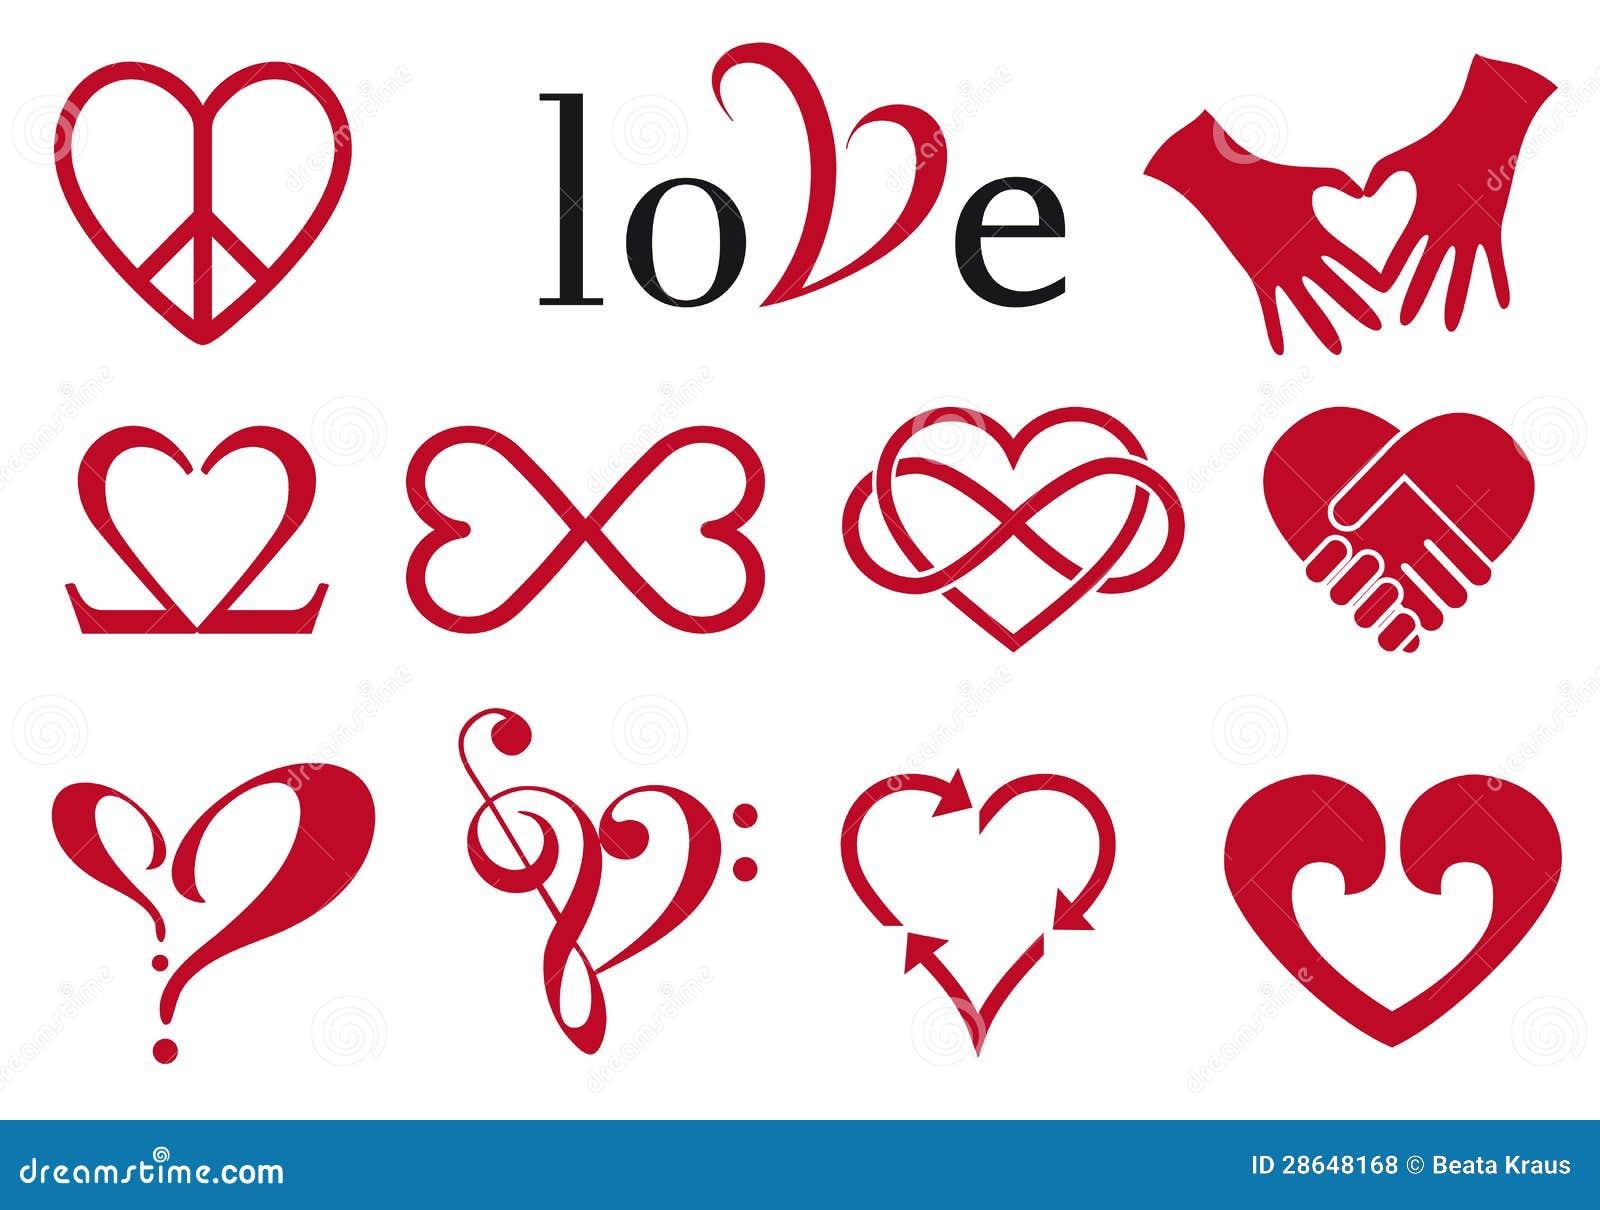 Abstract heart designs, vector set